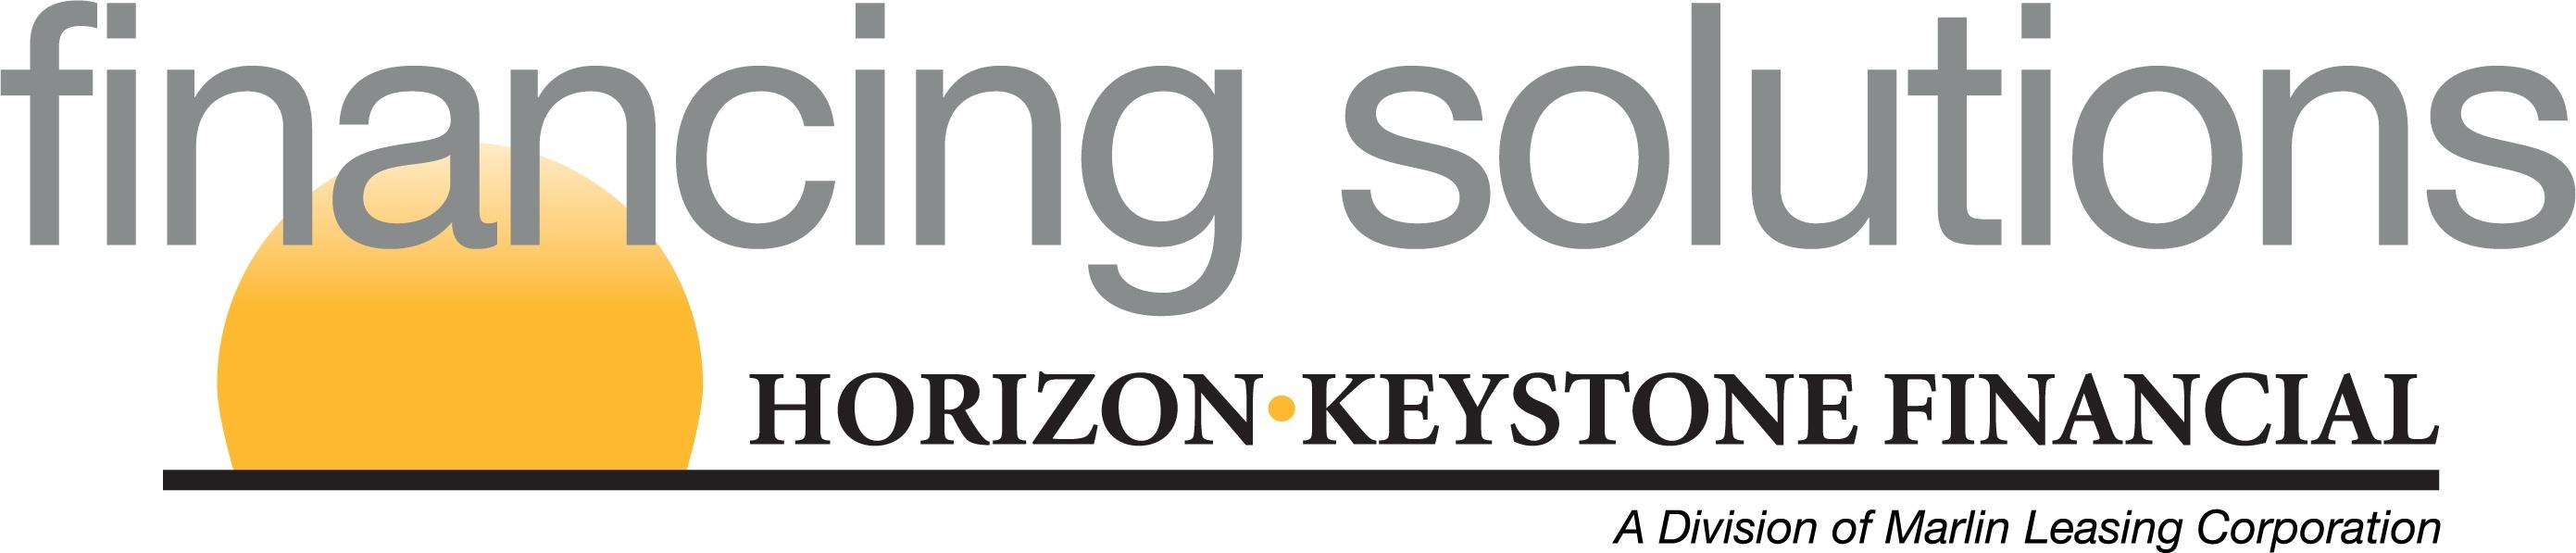 Office Furniture Financing | Horizon Keystone Financial